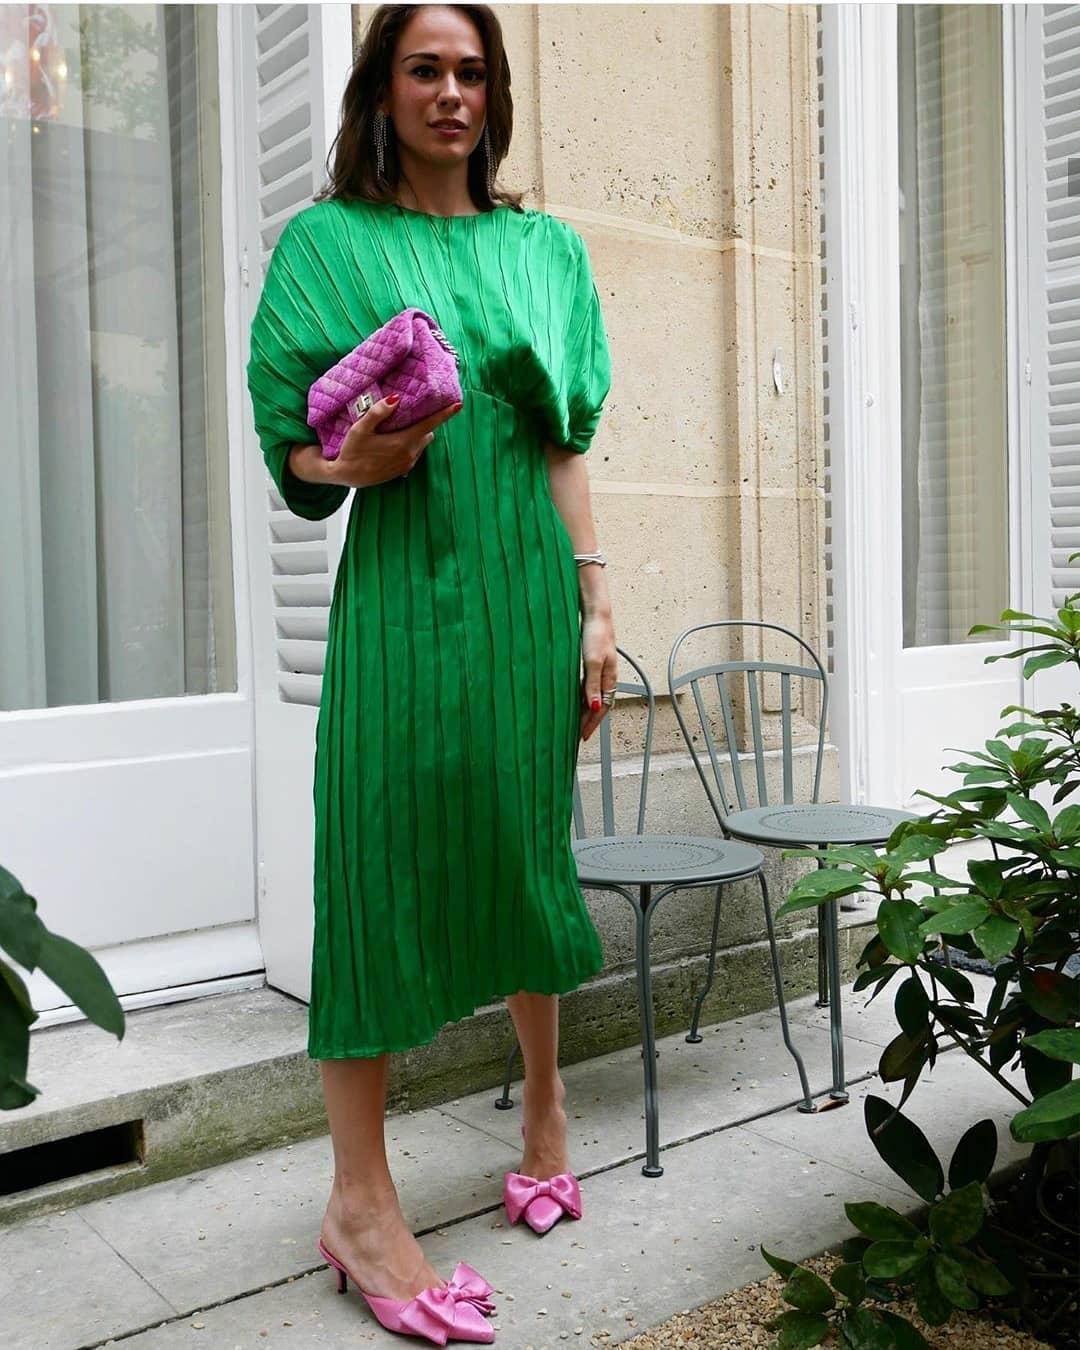 thérèse-hellström-pink-green-styling